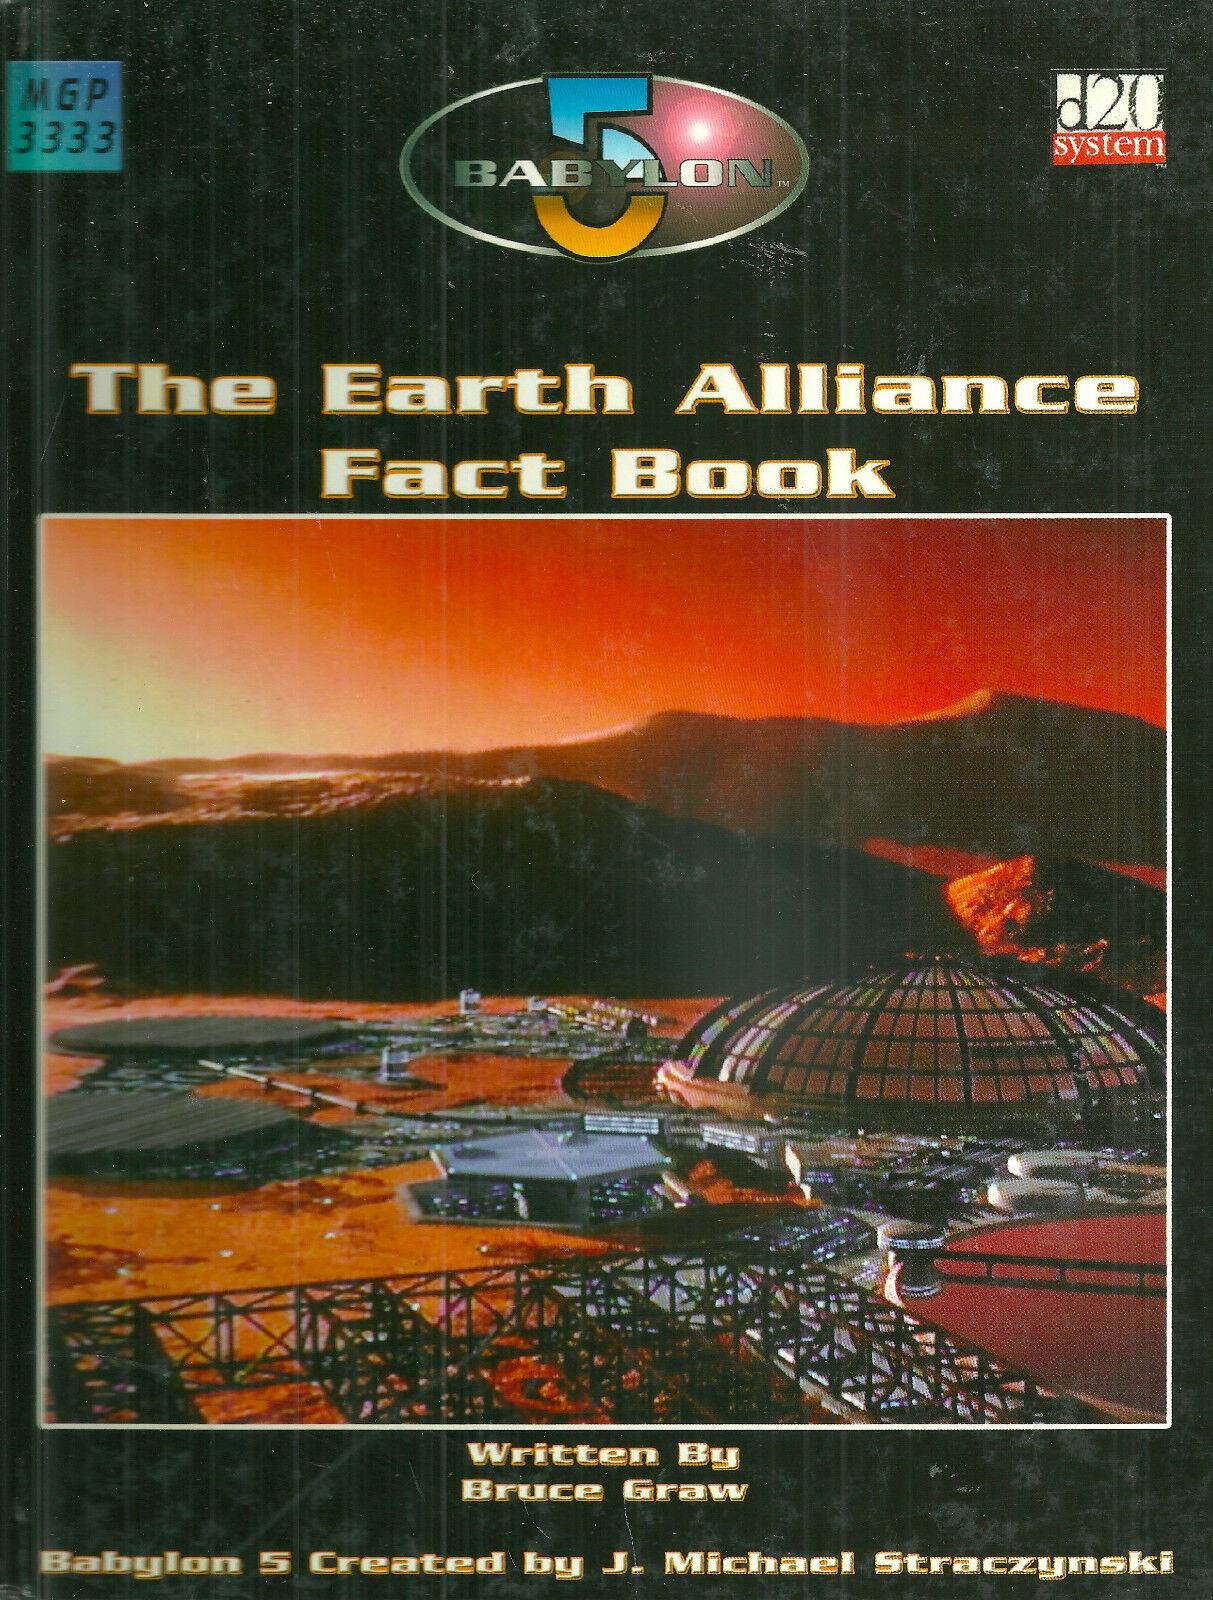 GRAW  BABYLON 5  THE EARTH ALLIANCE FACT BOOK  2003 1ST ED HC VG RPG RARE